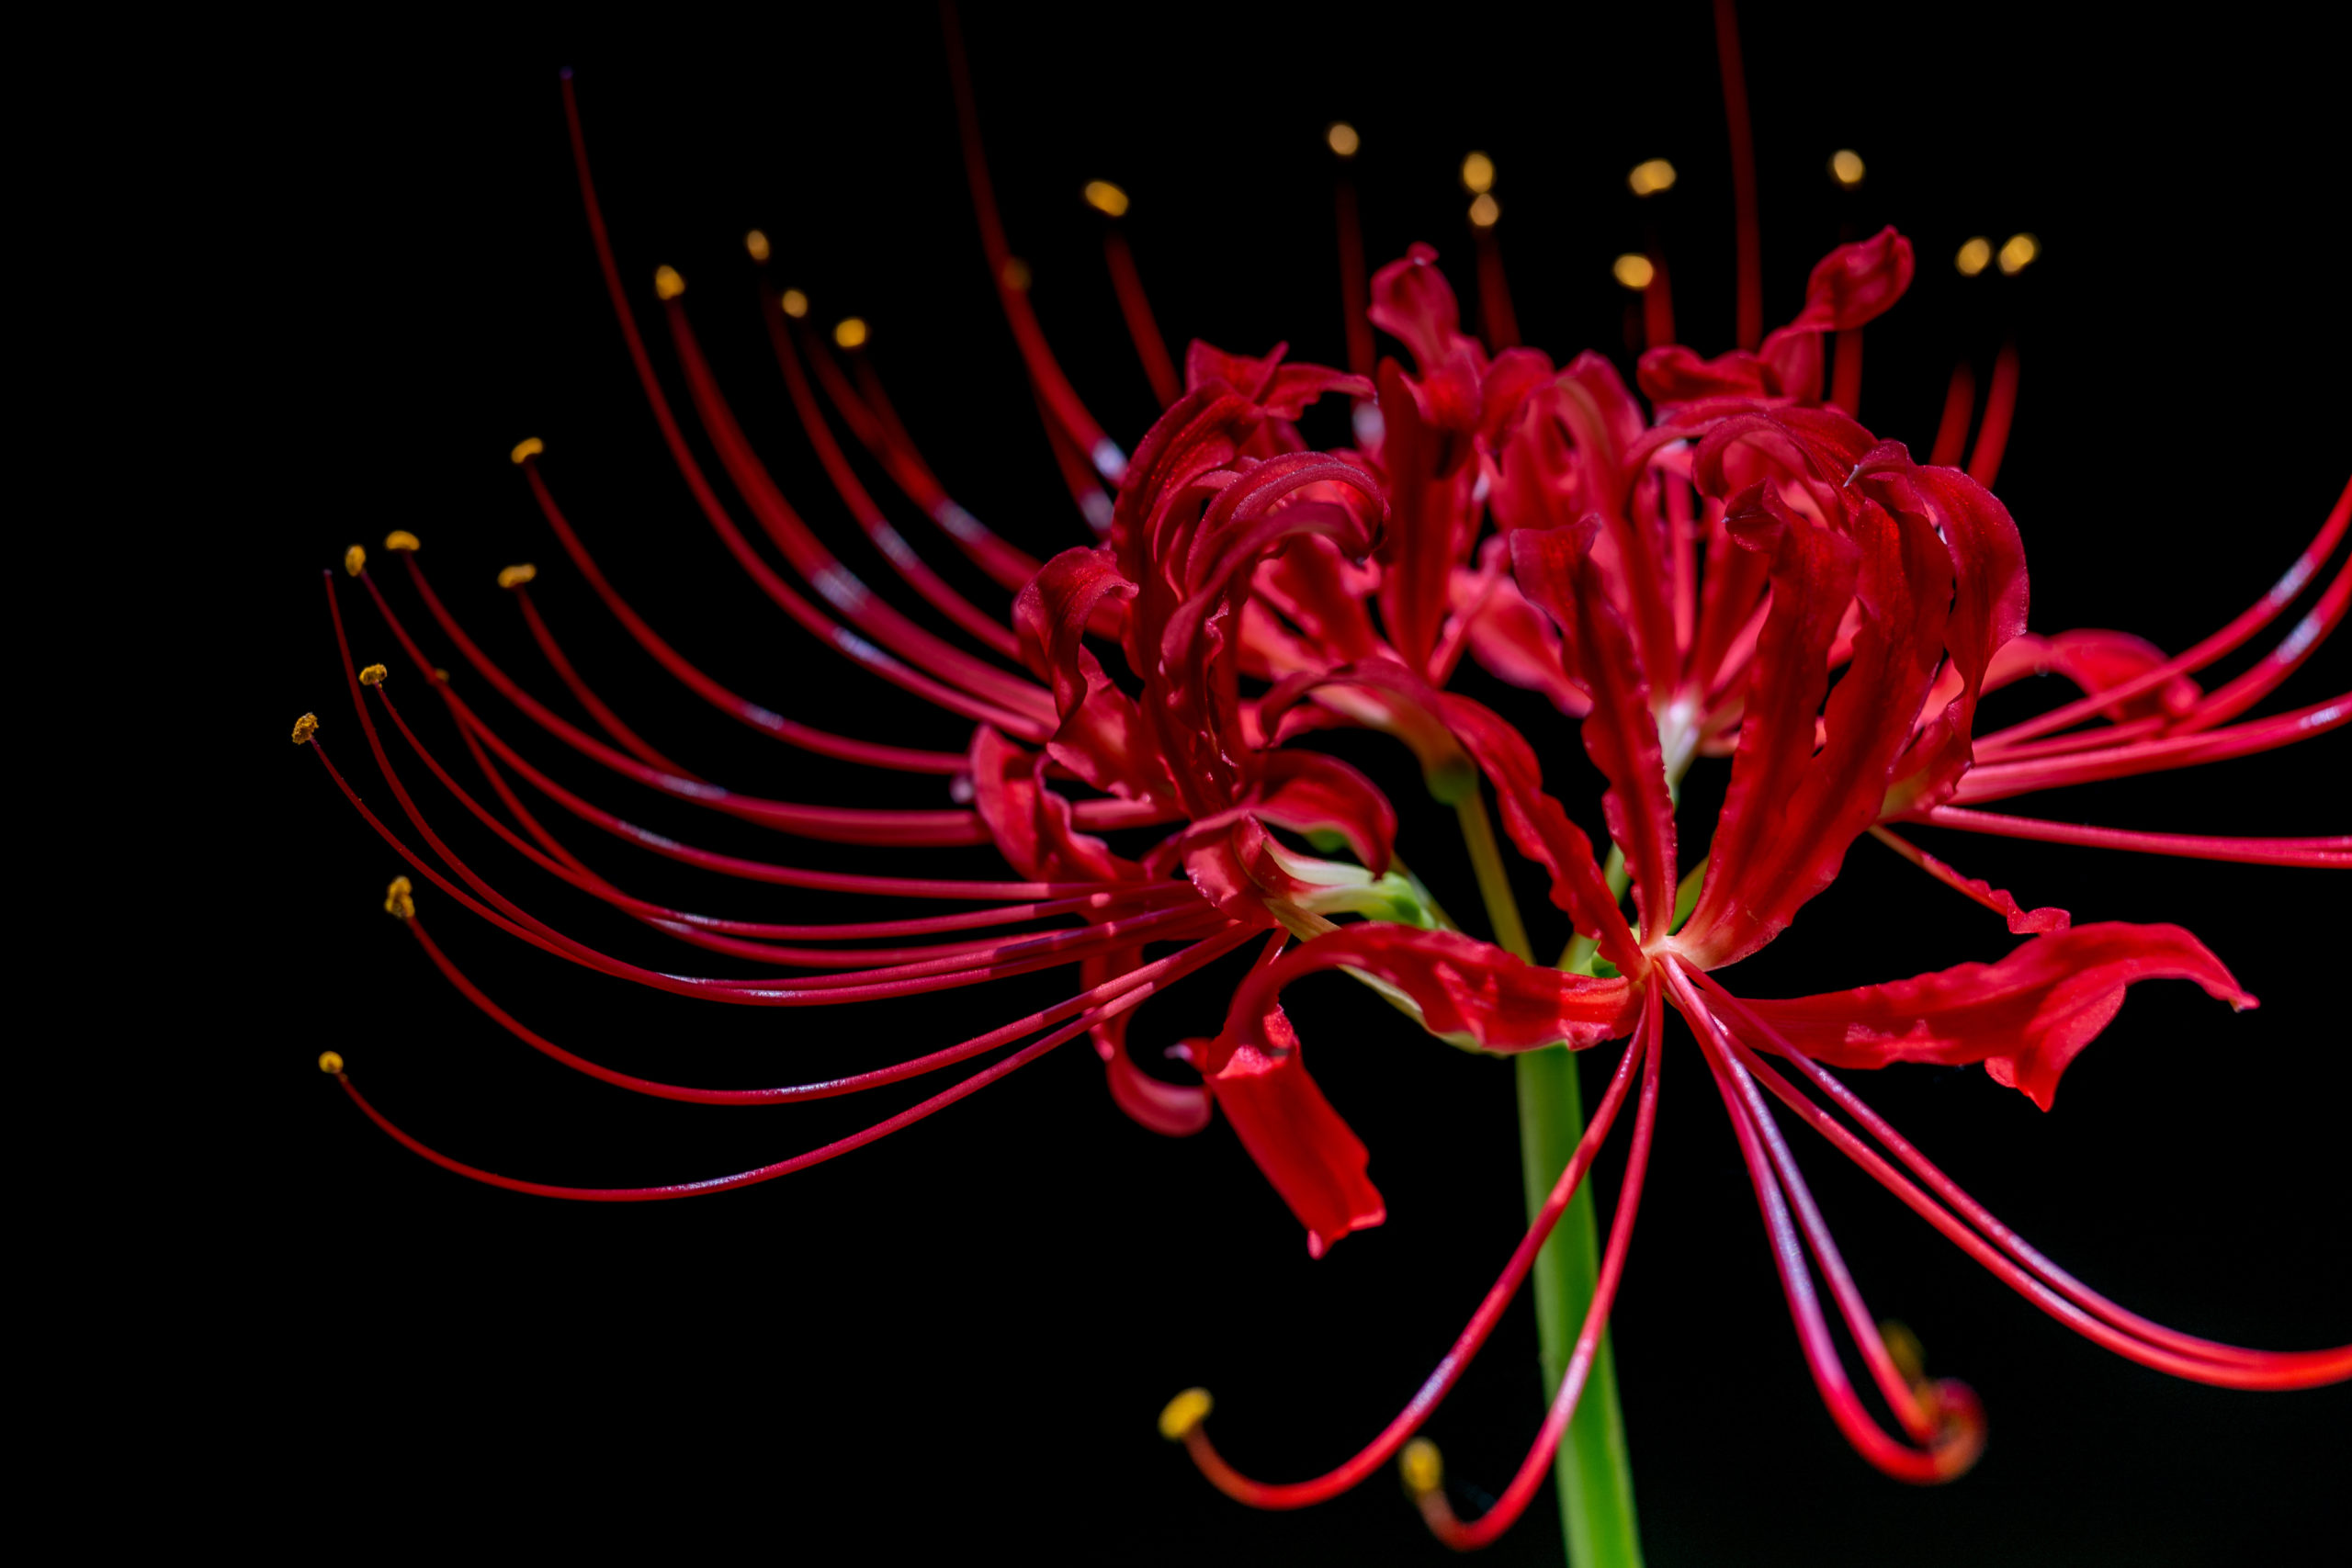 Red spider lily 曼殊沙華